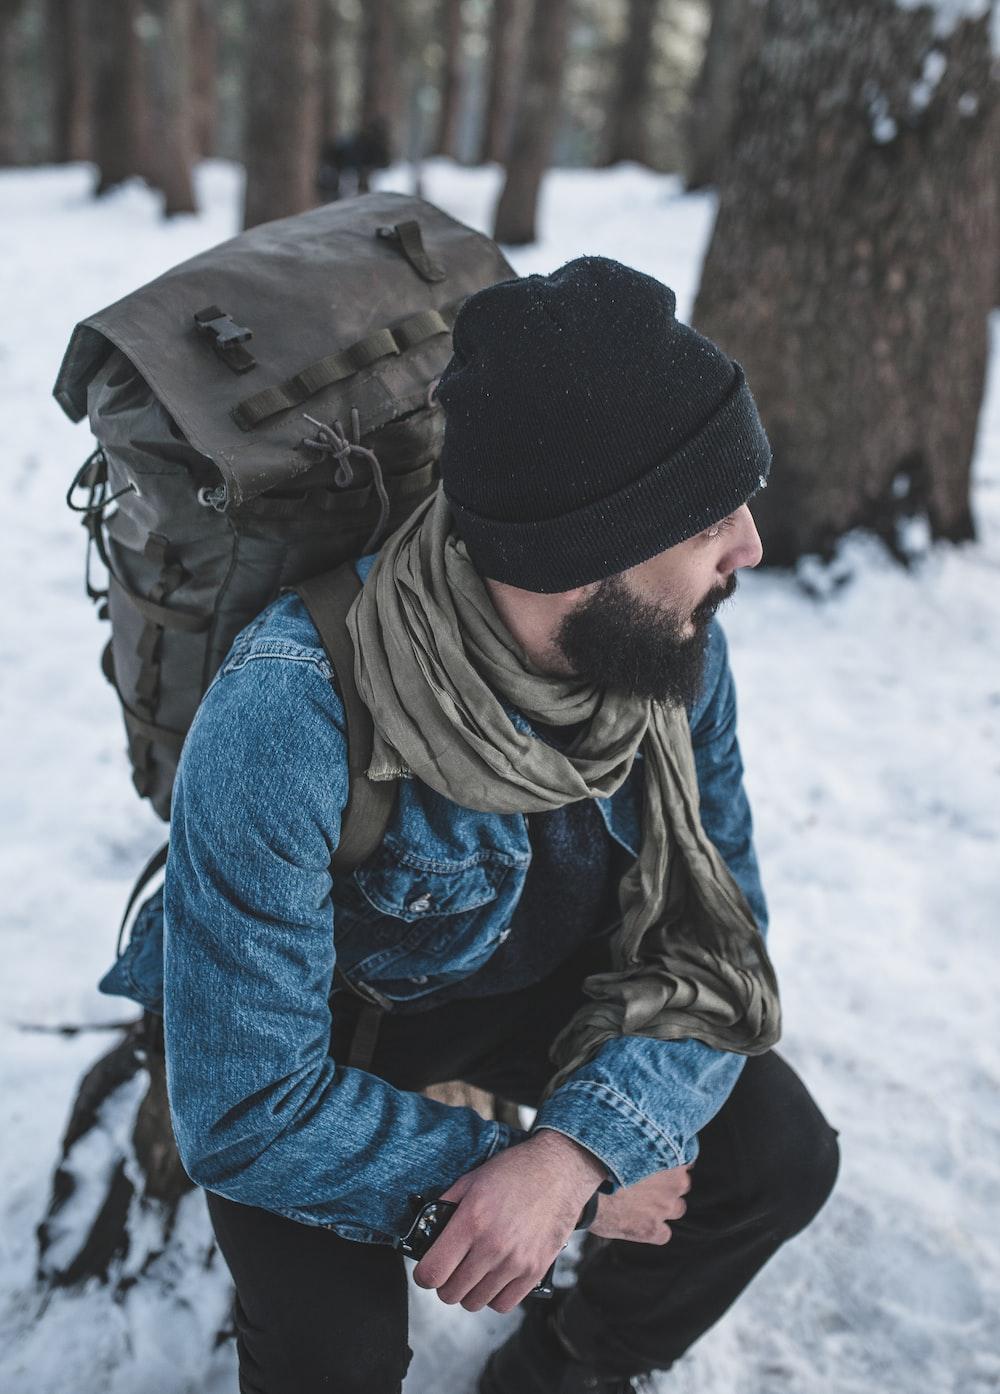 man sitting on snow near trees